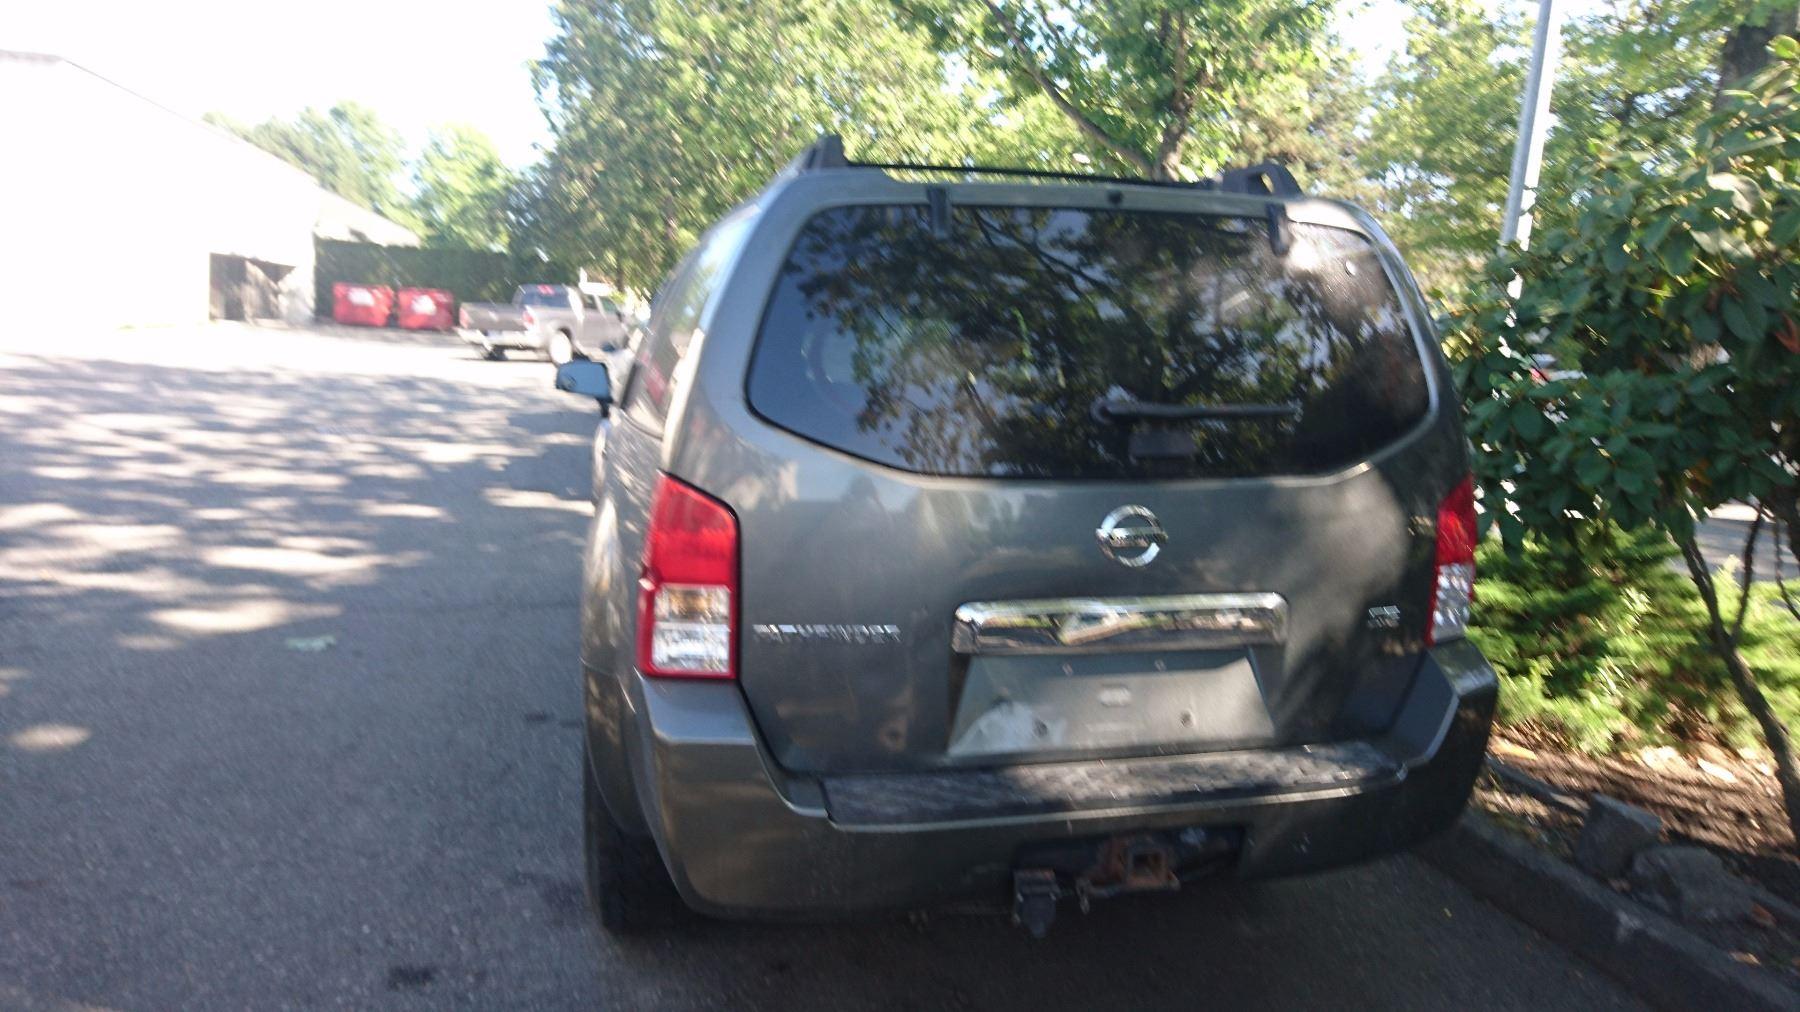 2006 NISSAN PATHFINDER, 4 DOOR SUV, GREY VIN